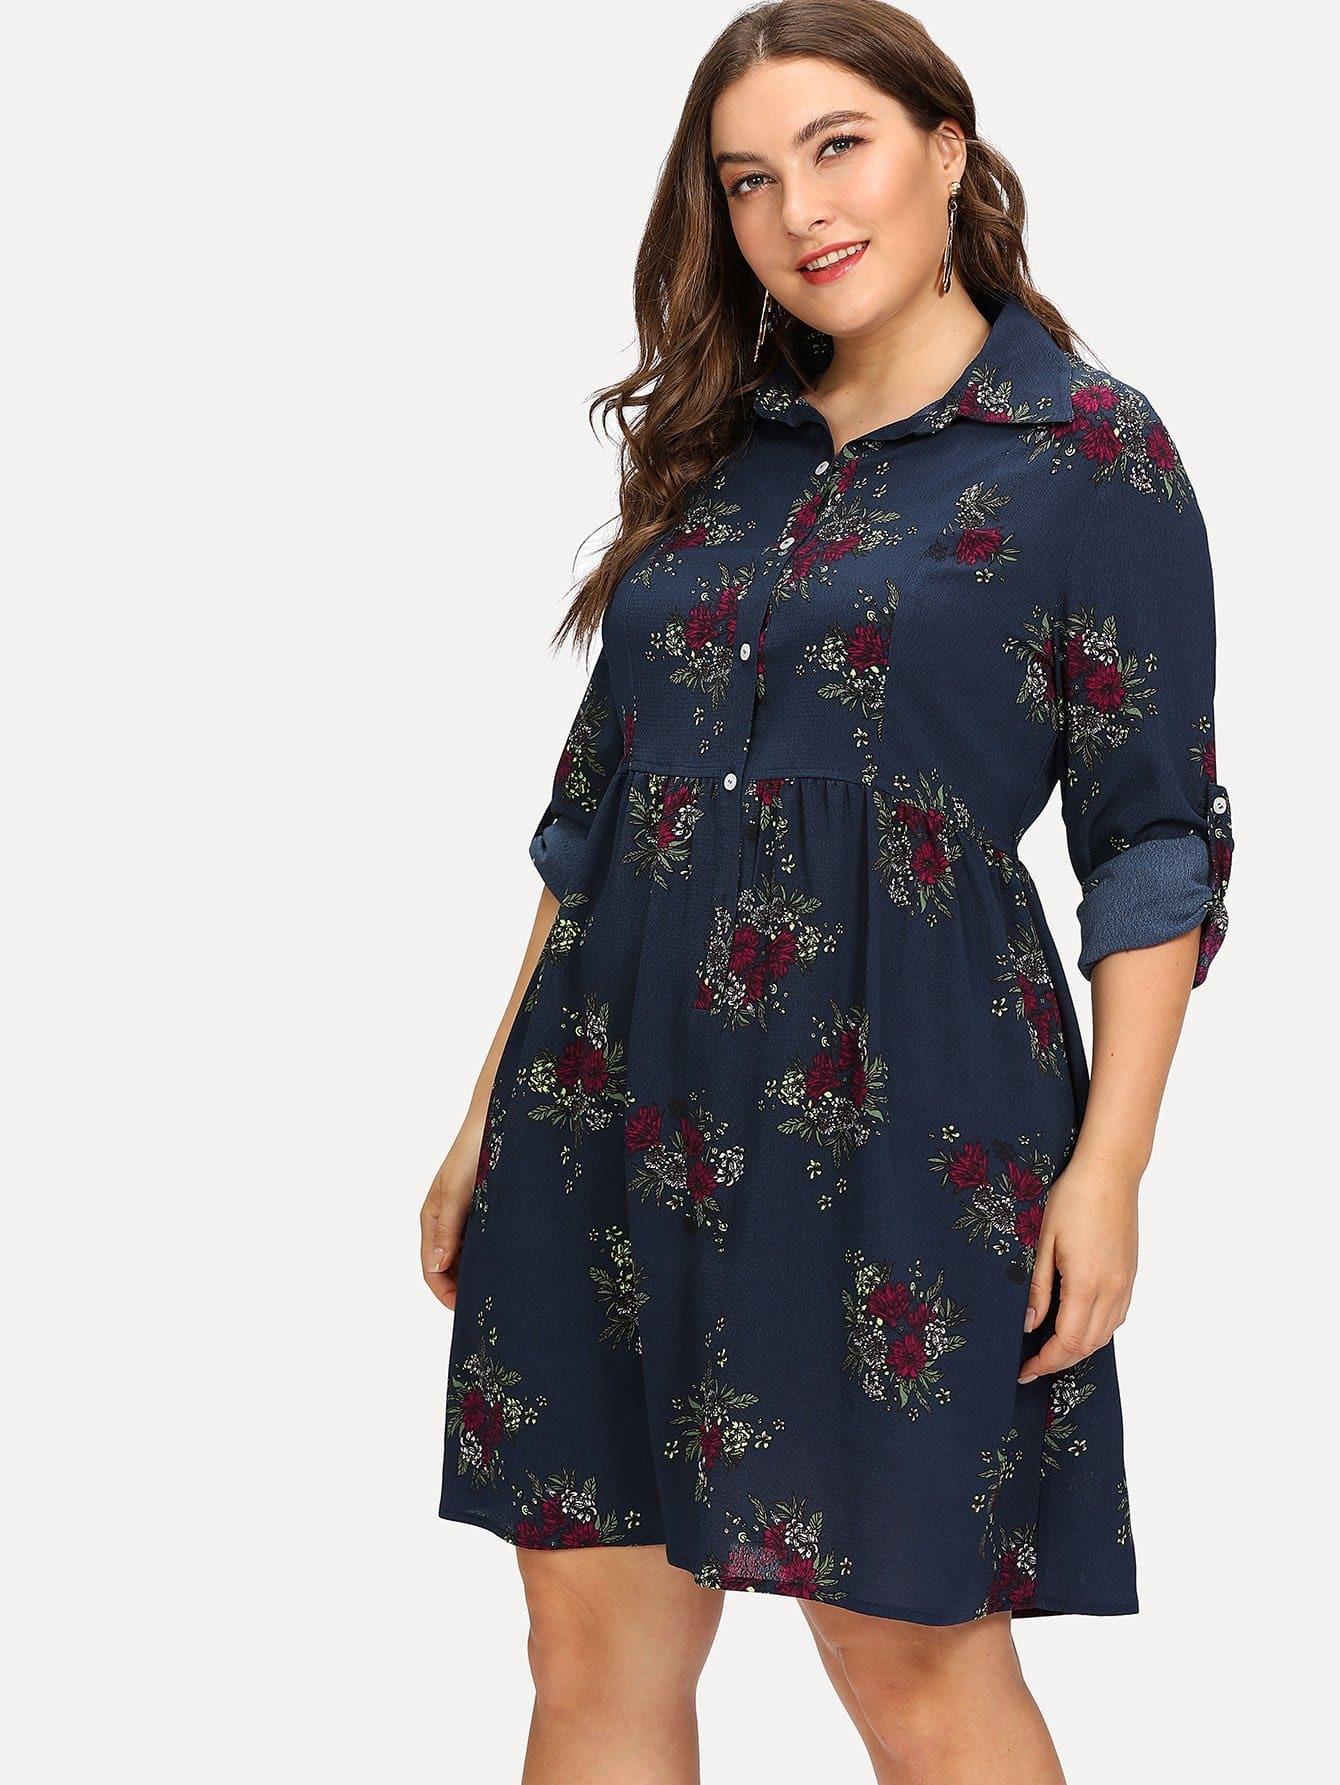 Button Placket Roll Tab Sleeve Floral Smock Dress raglan sleeve smock gingham dress